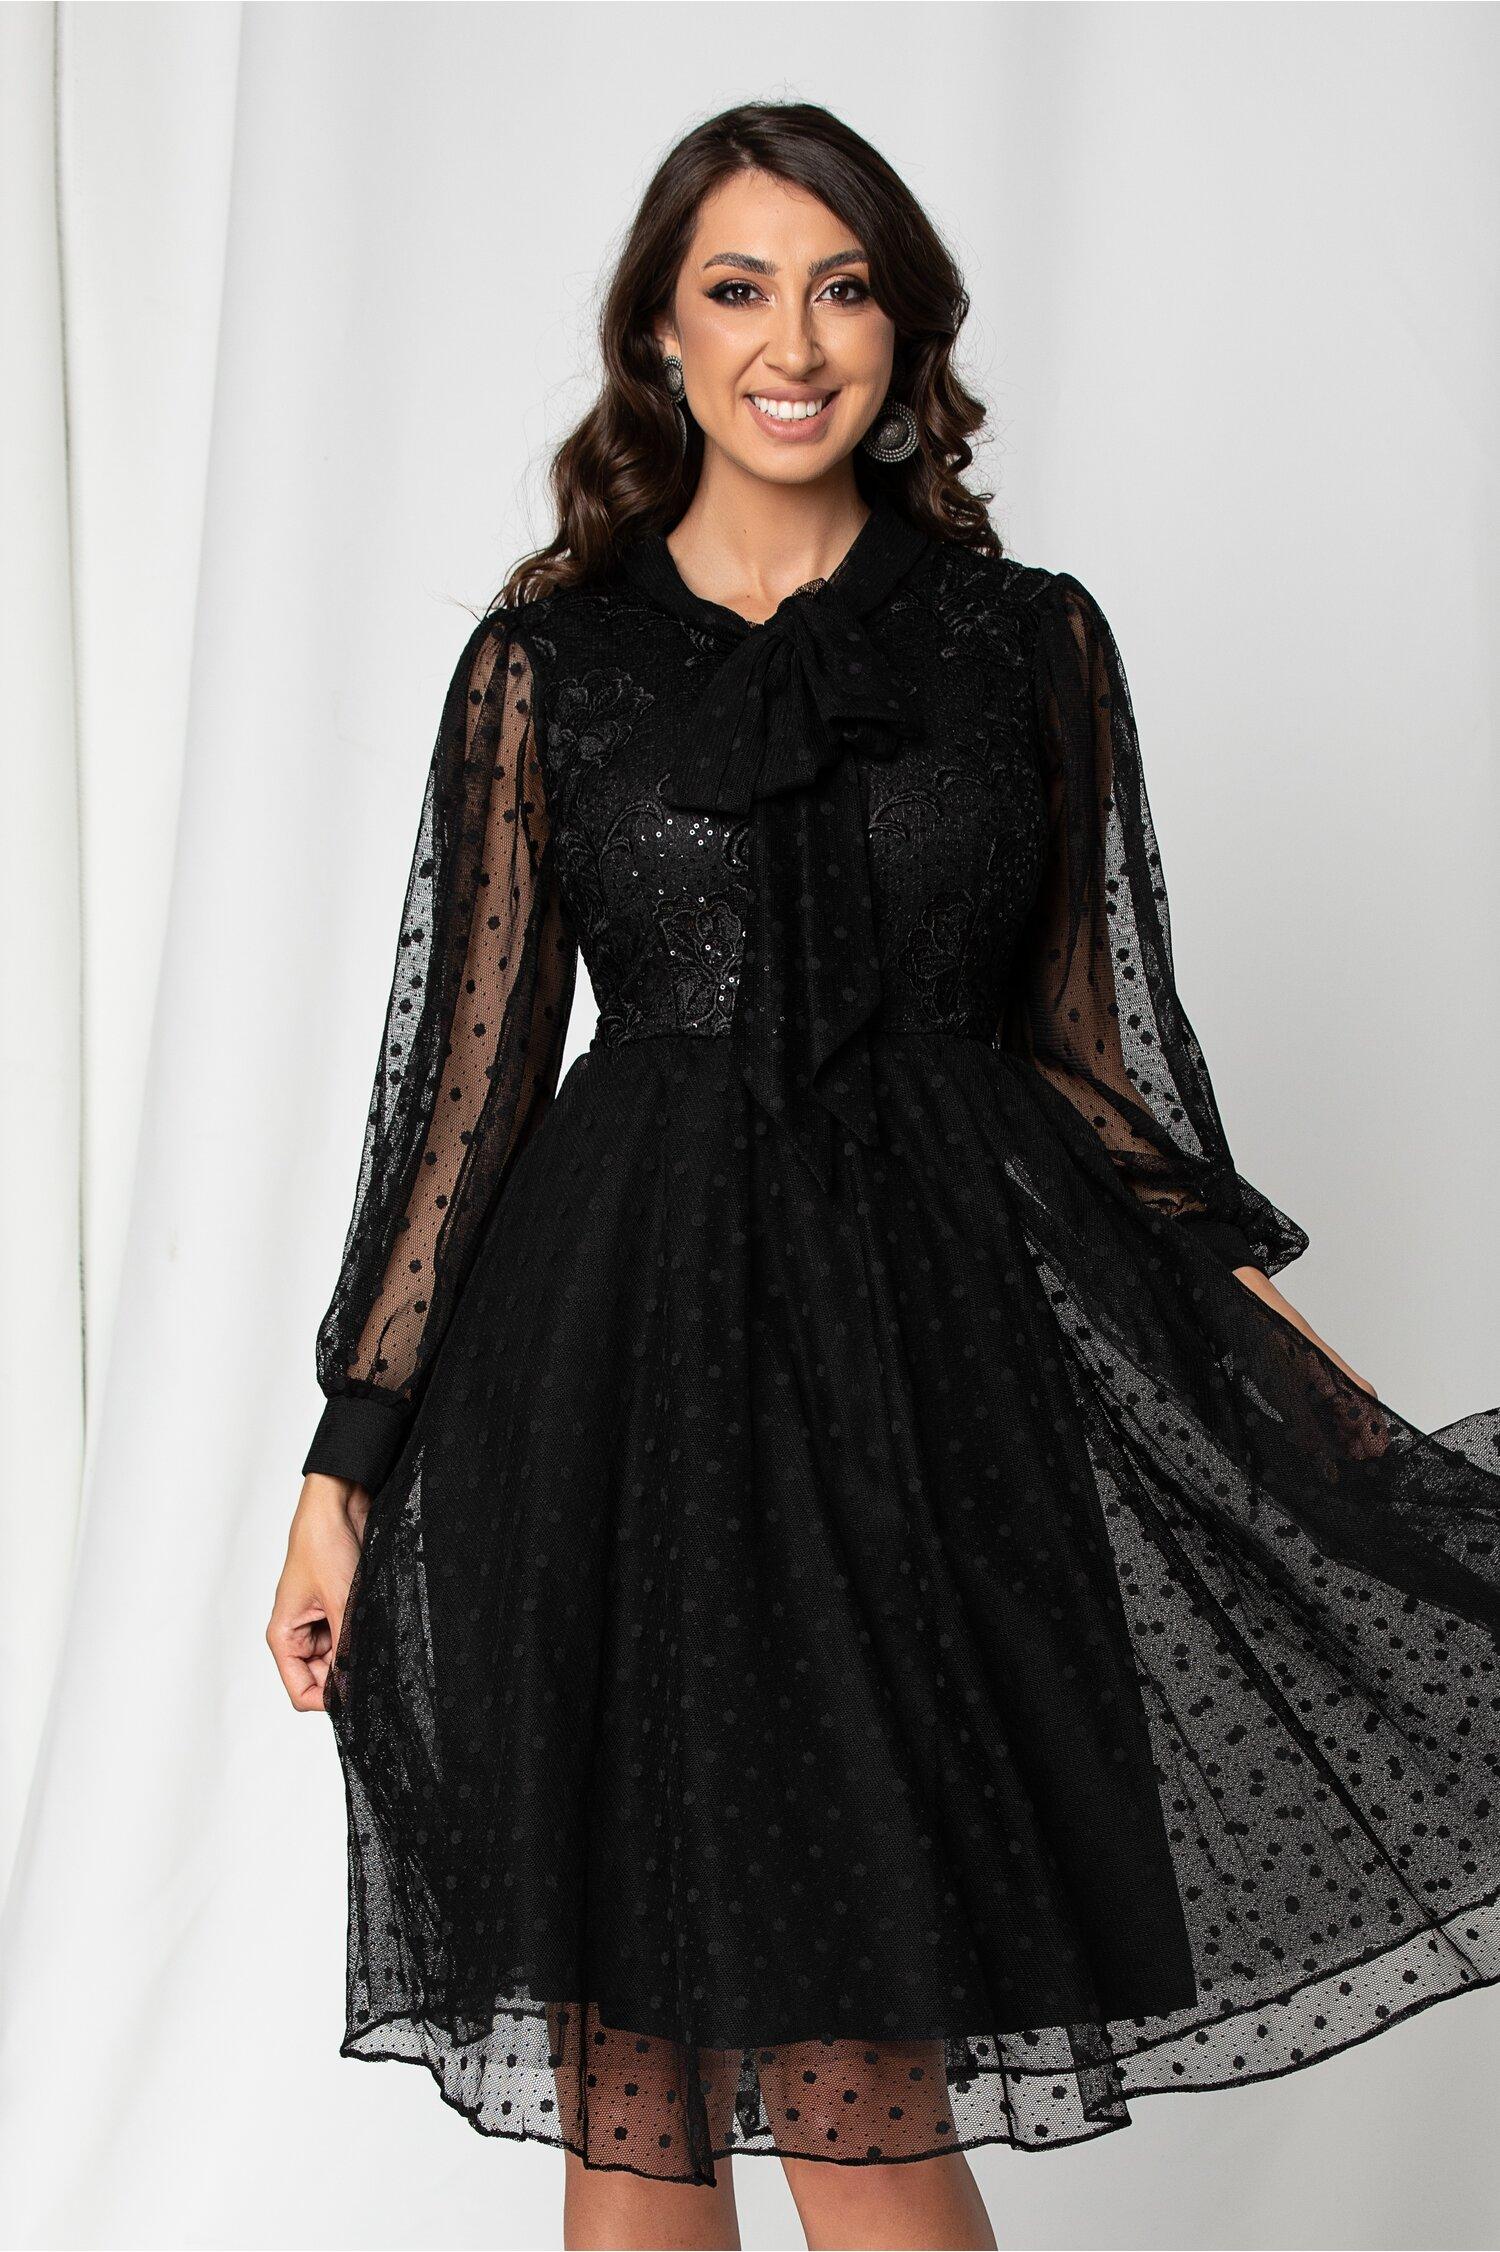 Rochie Ramona neagra accesorizata cu paiete si broderie